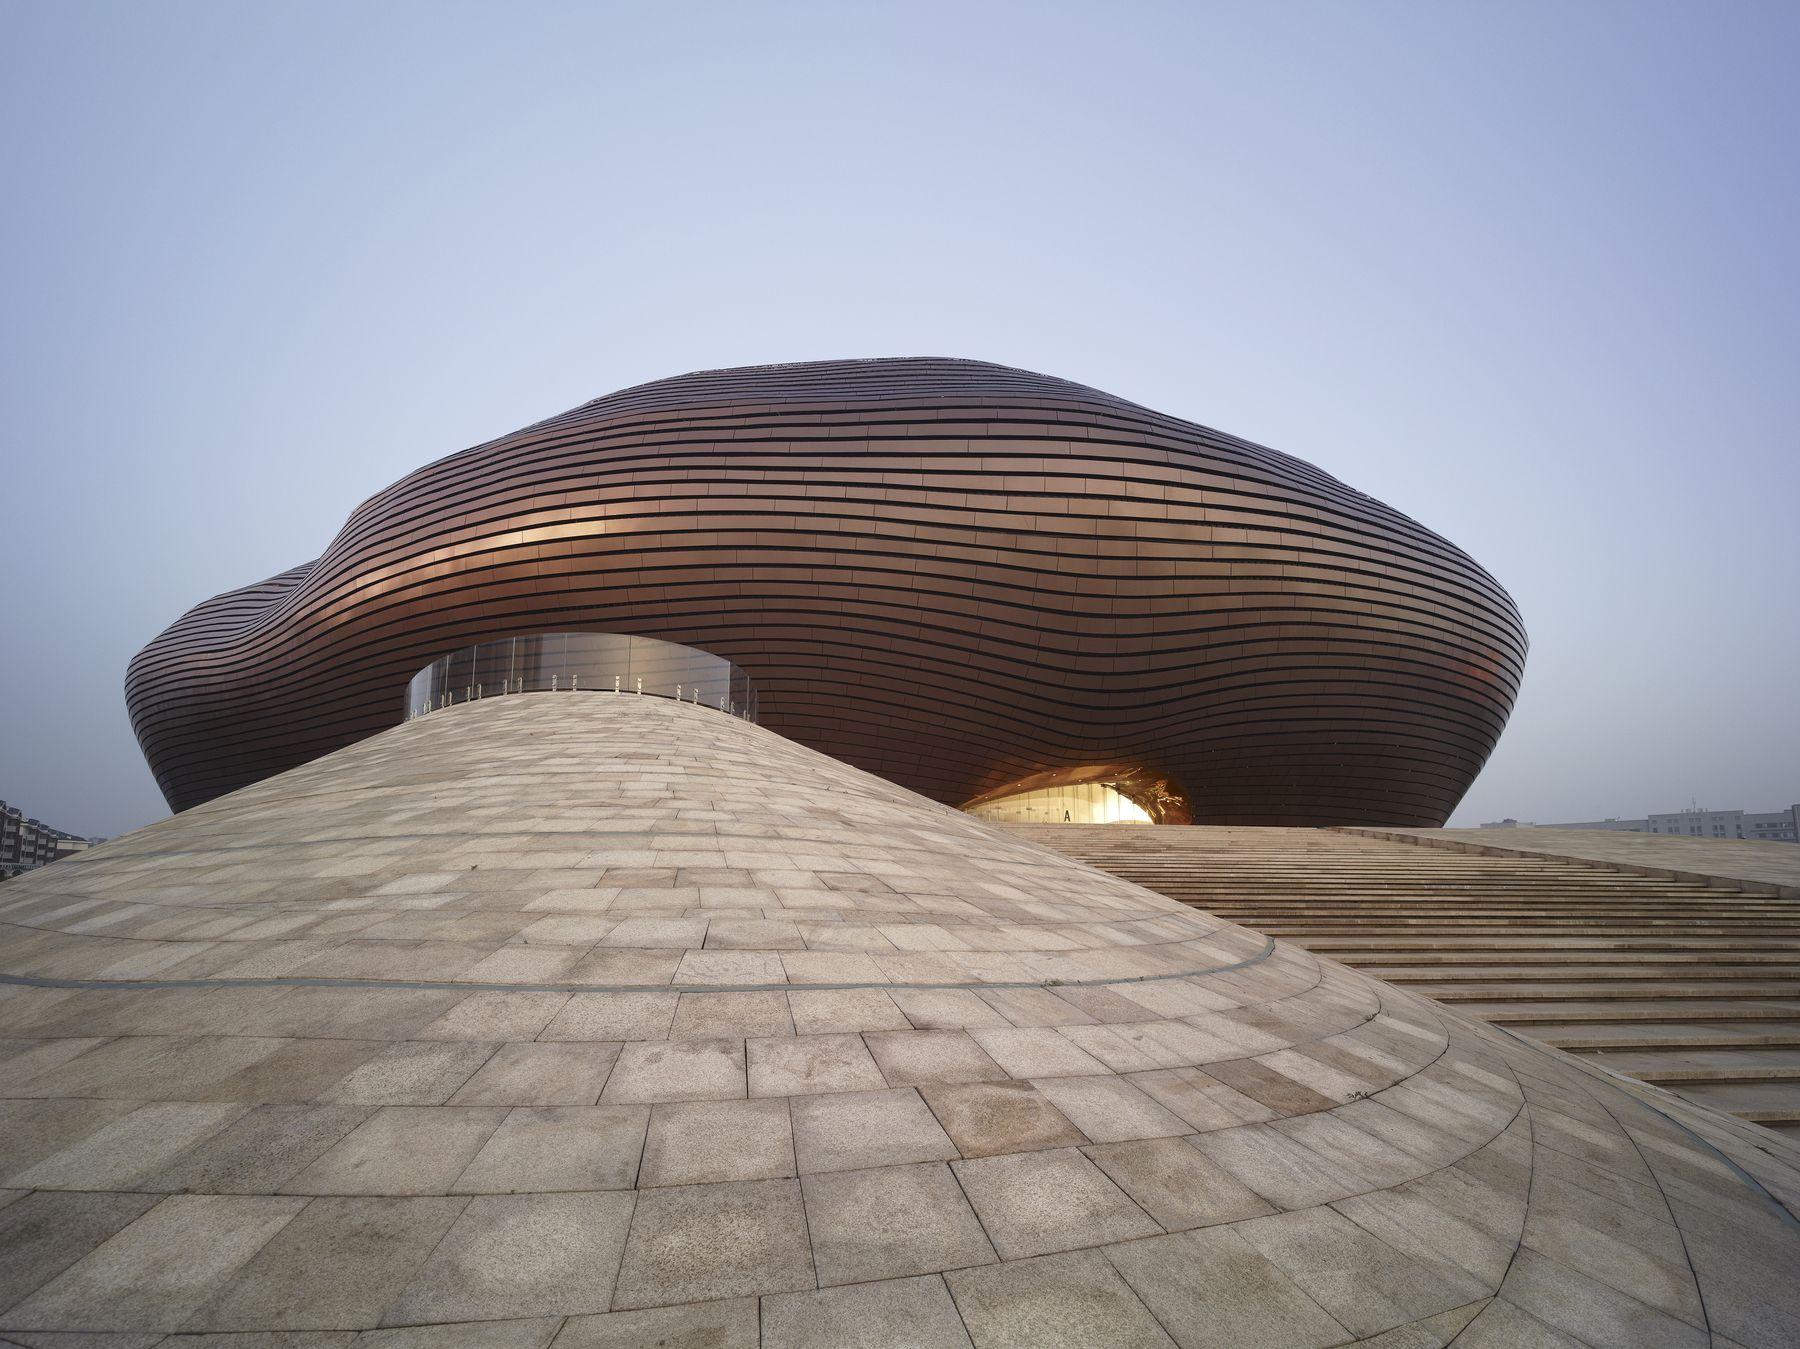 Museo Ordos (Città di Ordos, Cina)